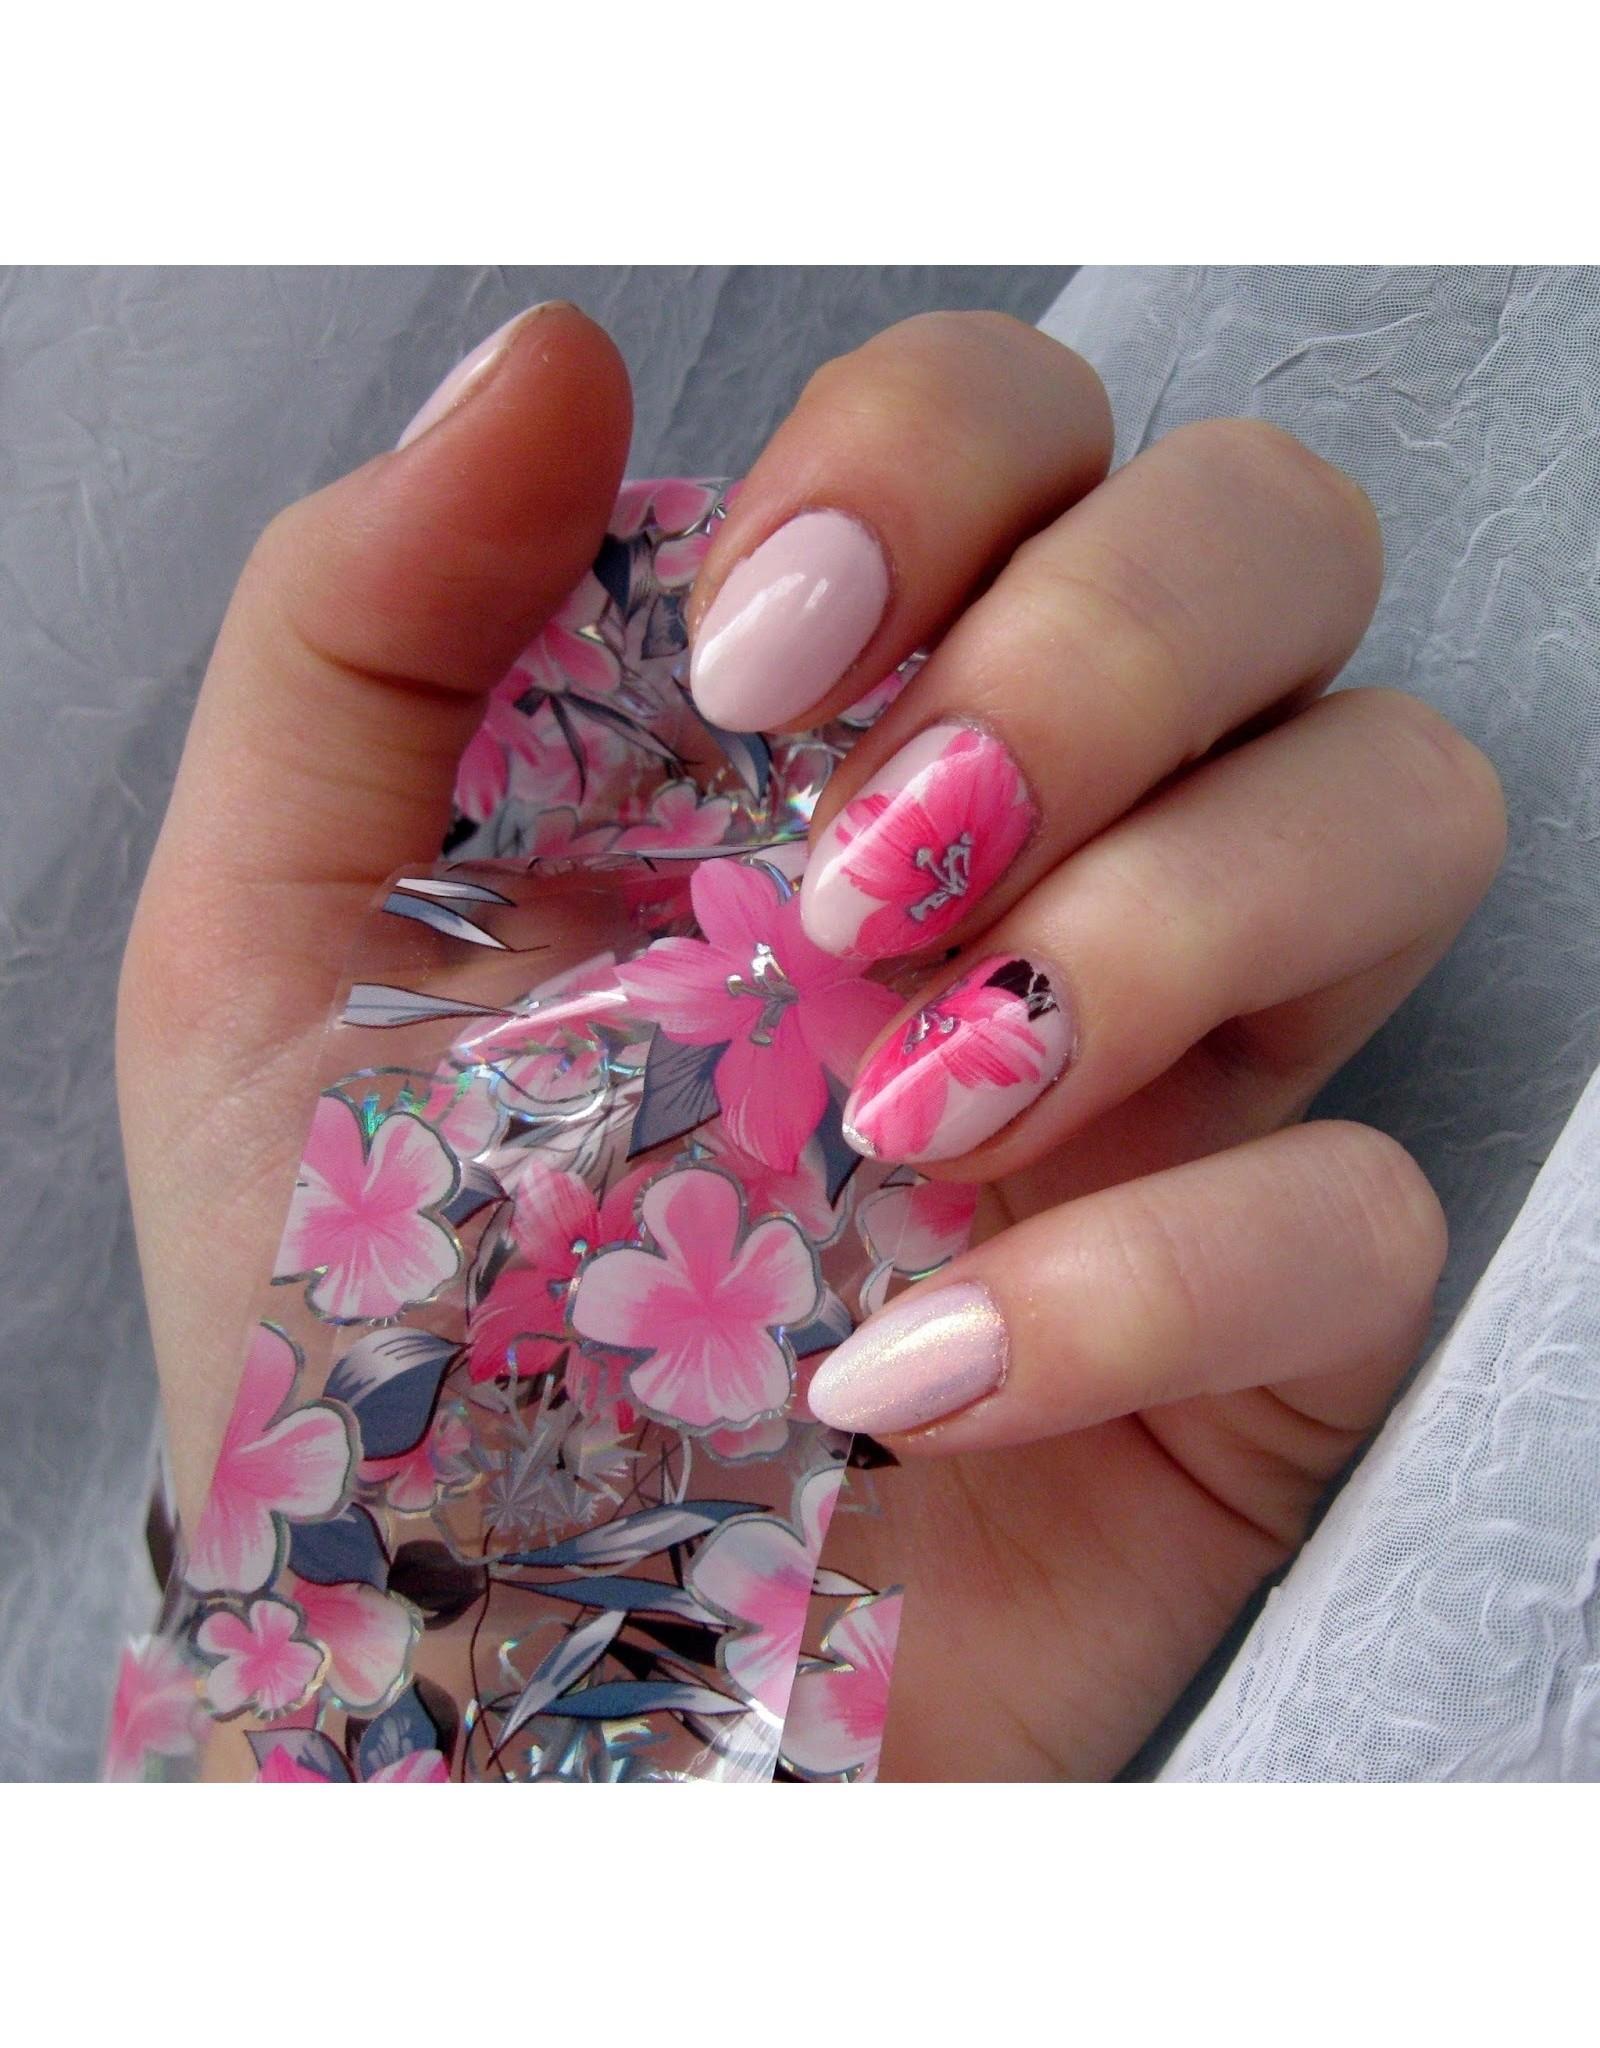 Merkloos Nagel transfer folie nail art set (01) Christmas